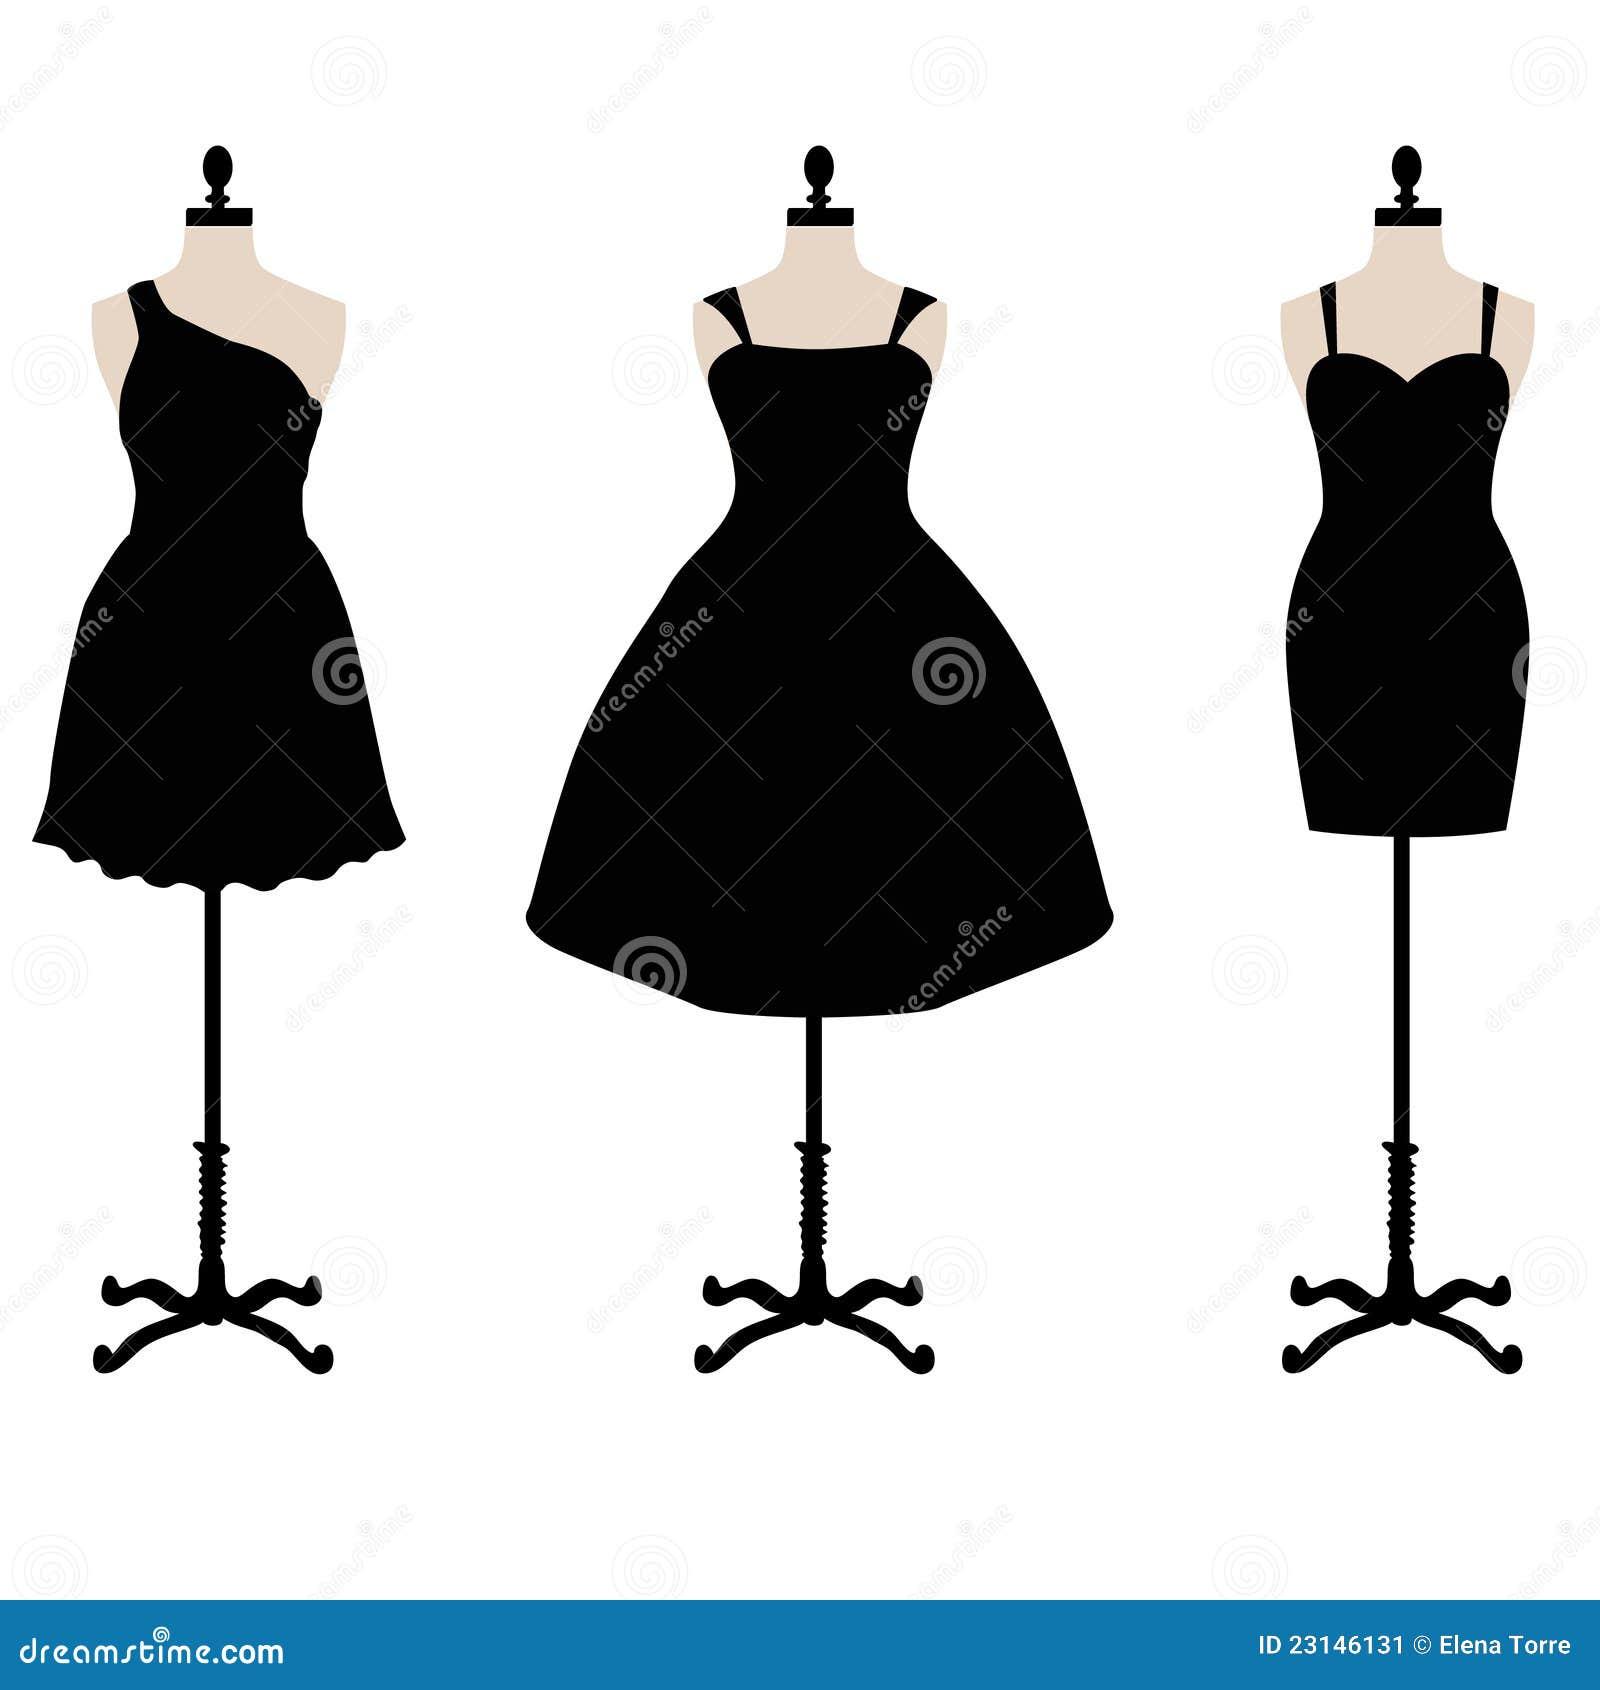 photoshop dress clipart - photo #22